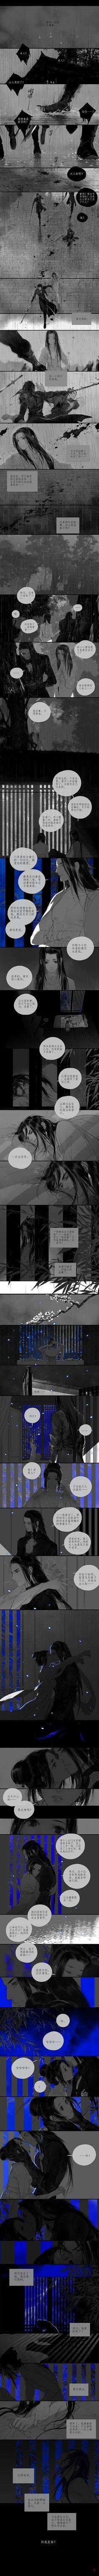 Ibuki satsuki, part of the comic I missed